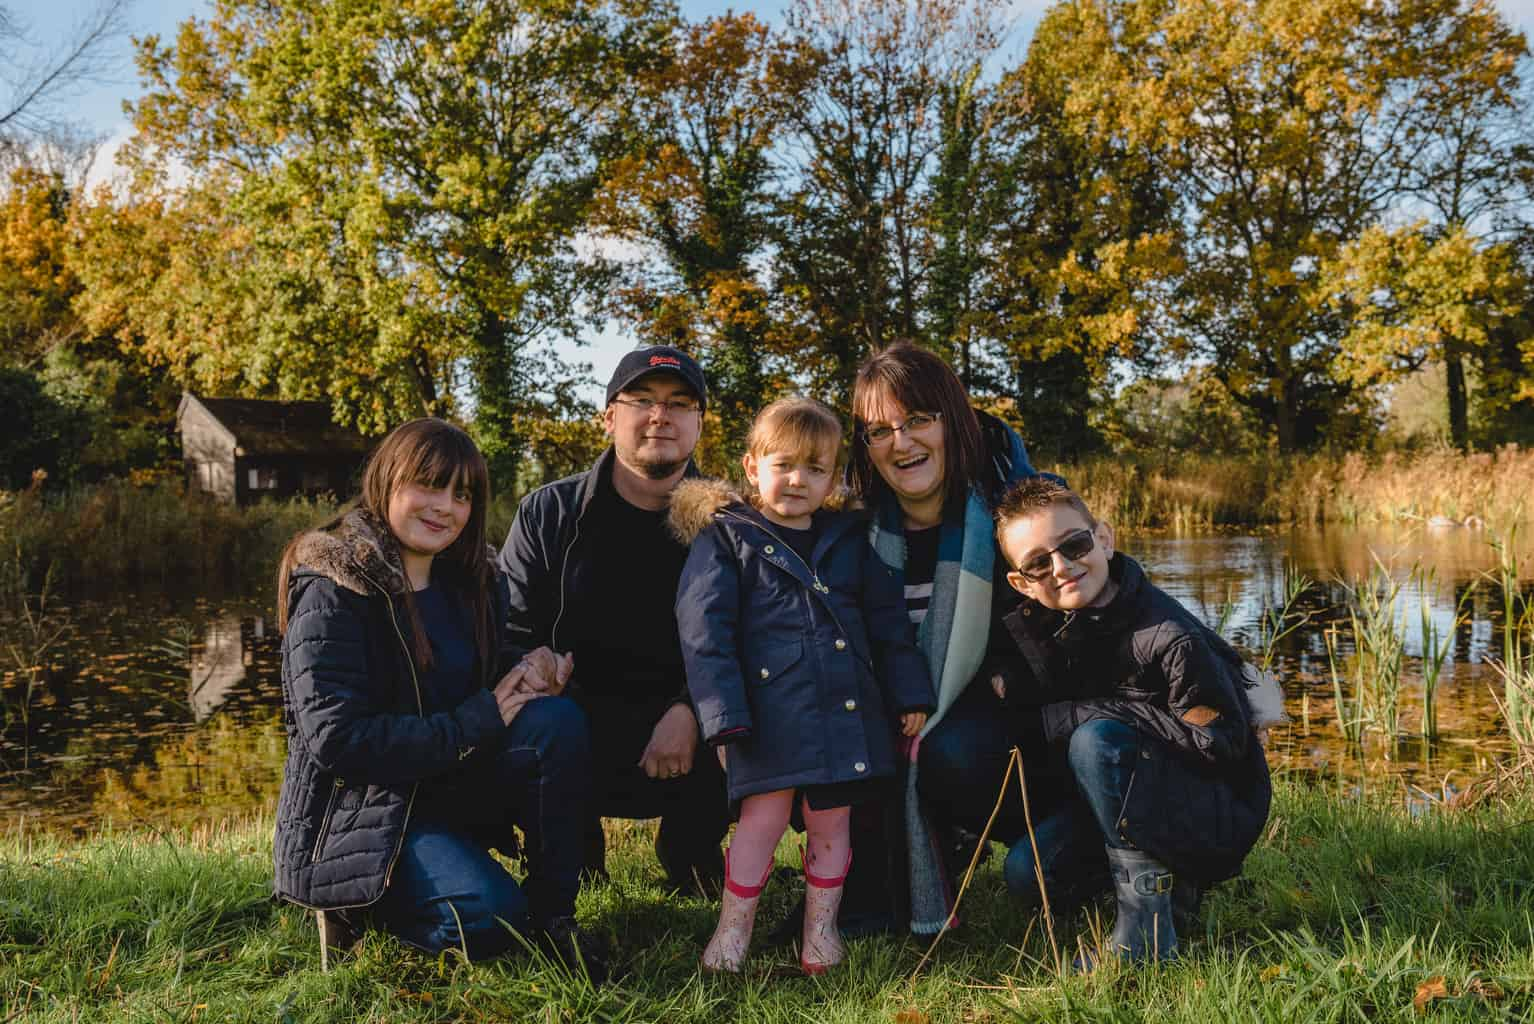 An Autumn Family Mini Photo Shoot with Beth Moseley Photography